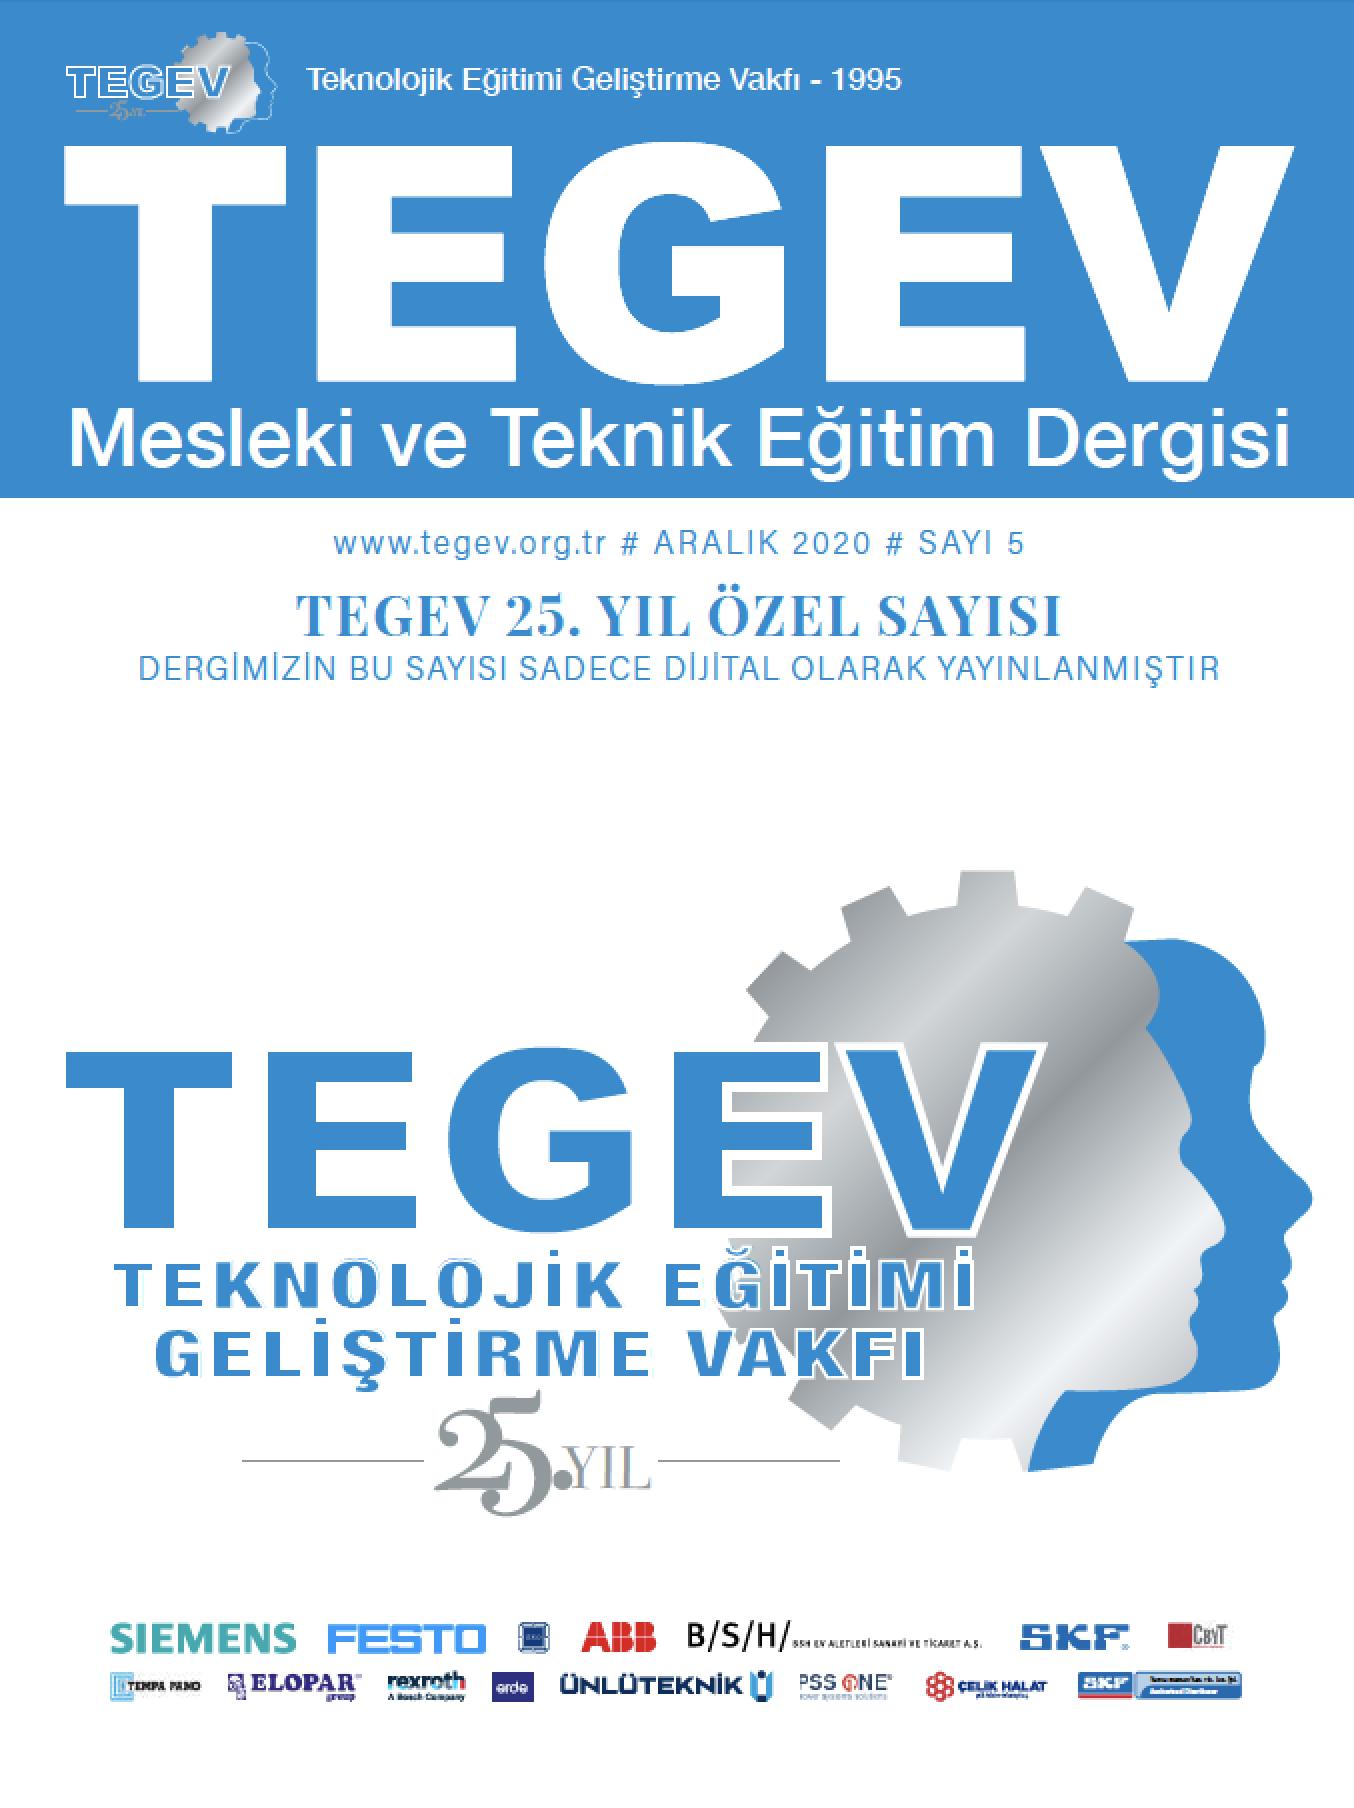 tegev-dergi-aralik-2020-sayi-5